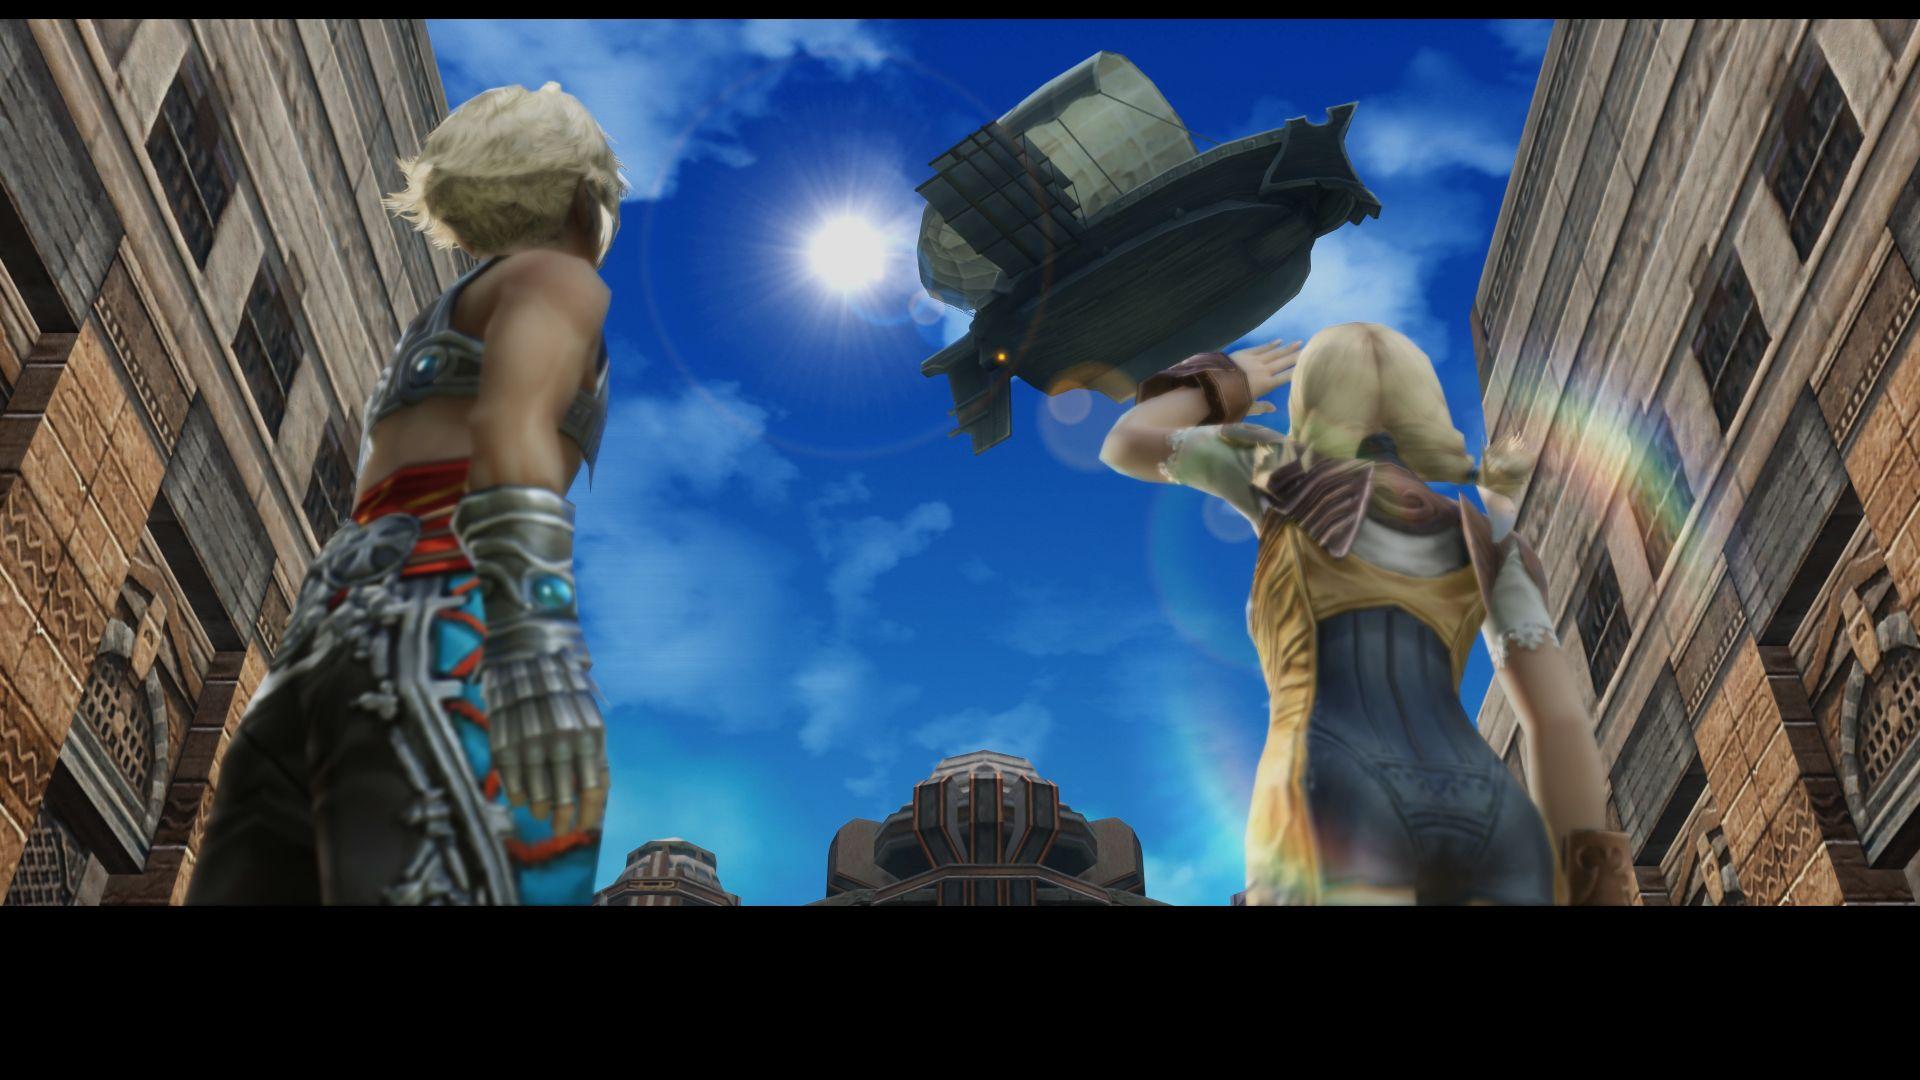 Final Fantasy Xii The Zodiac Age On Steam